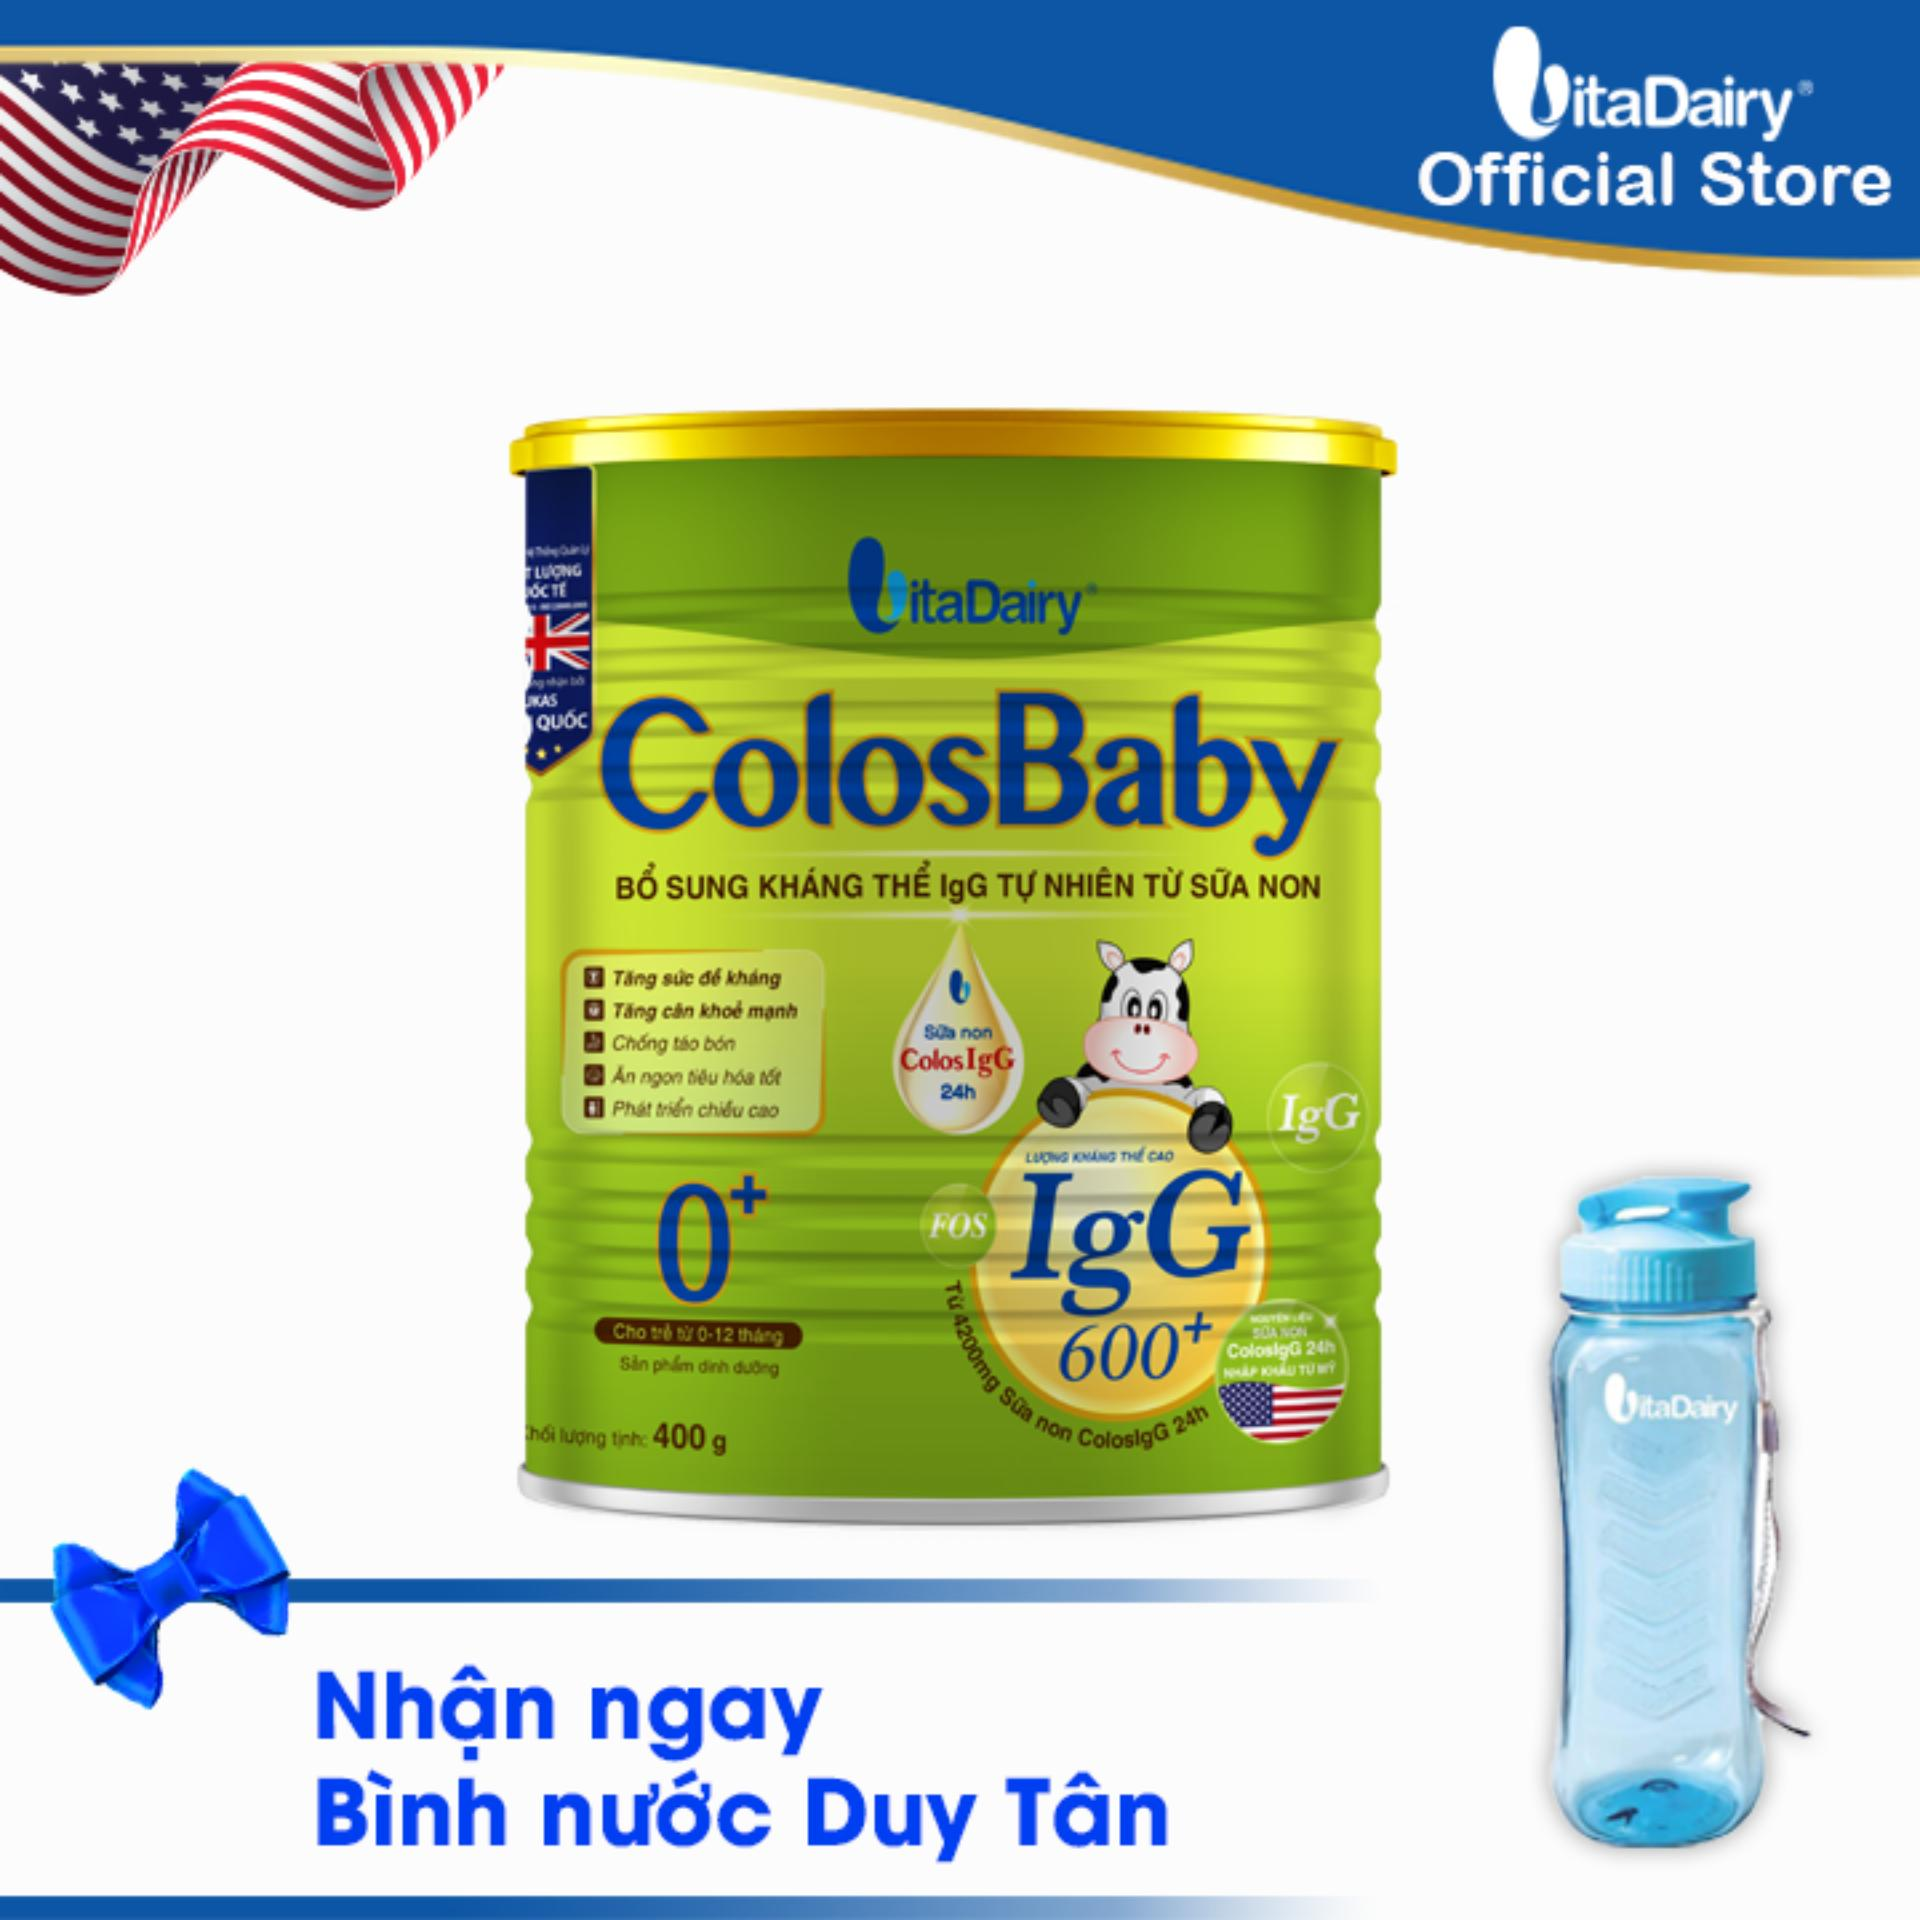 Sữa non COLOSBABY 600 IgG 0+ 400G